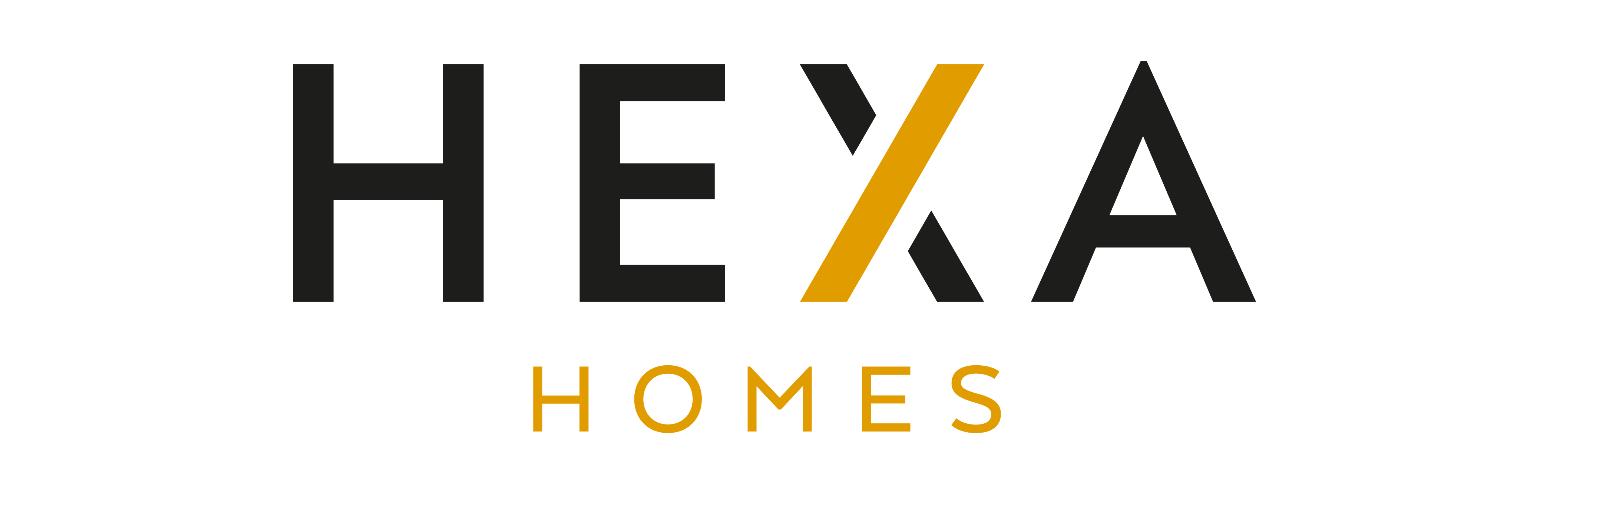 Hexa Homes